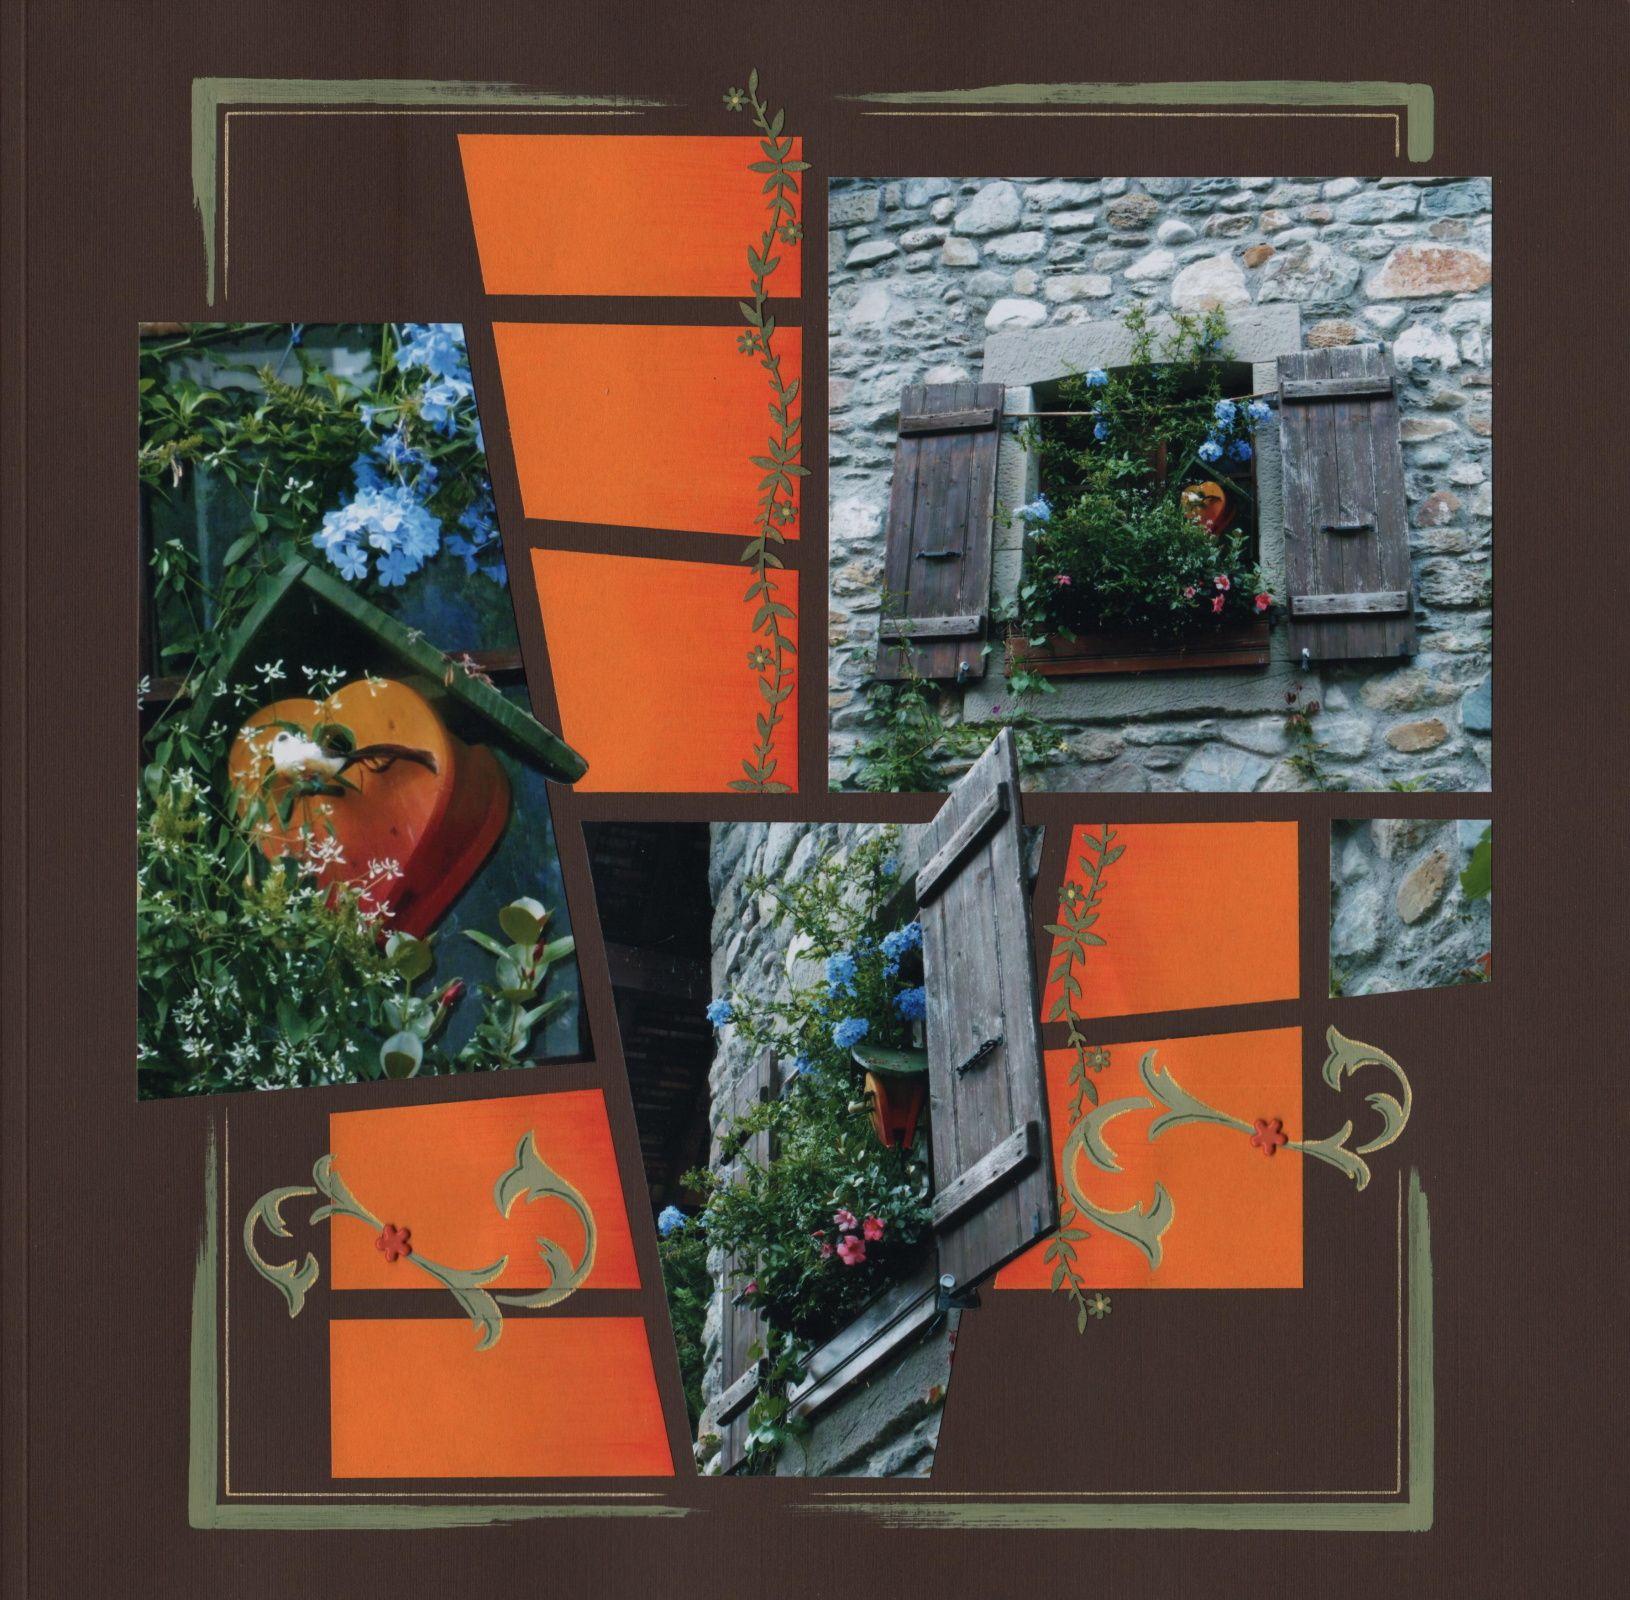 mat riel utilis gabarit azza duo vitrail papier azza orange d cors duo plumes attaches. Black Bedroom Furniture Sets. Home Design Ideas